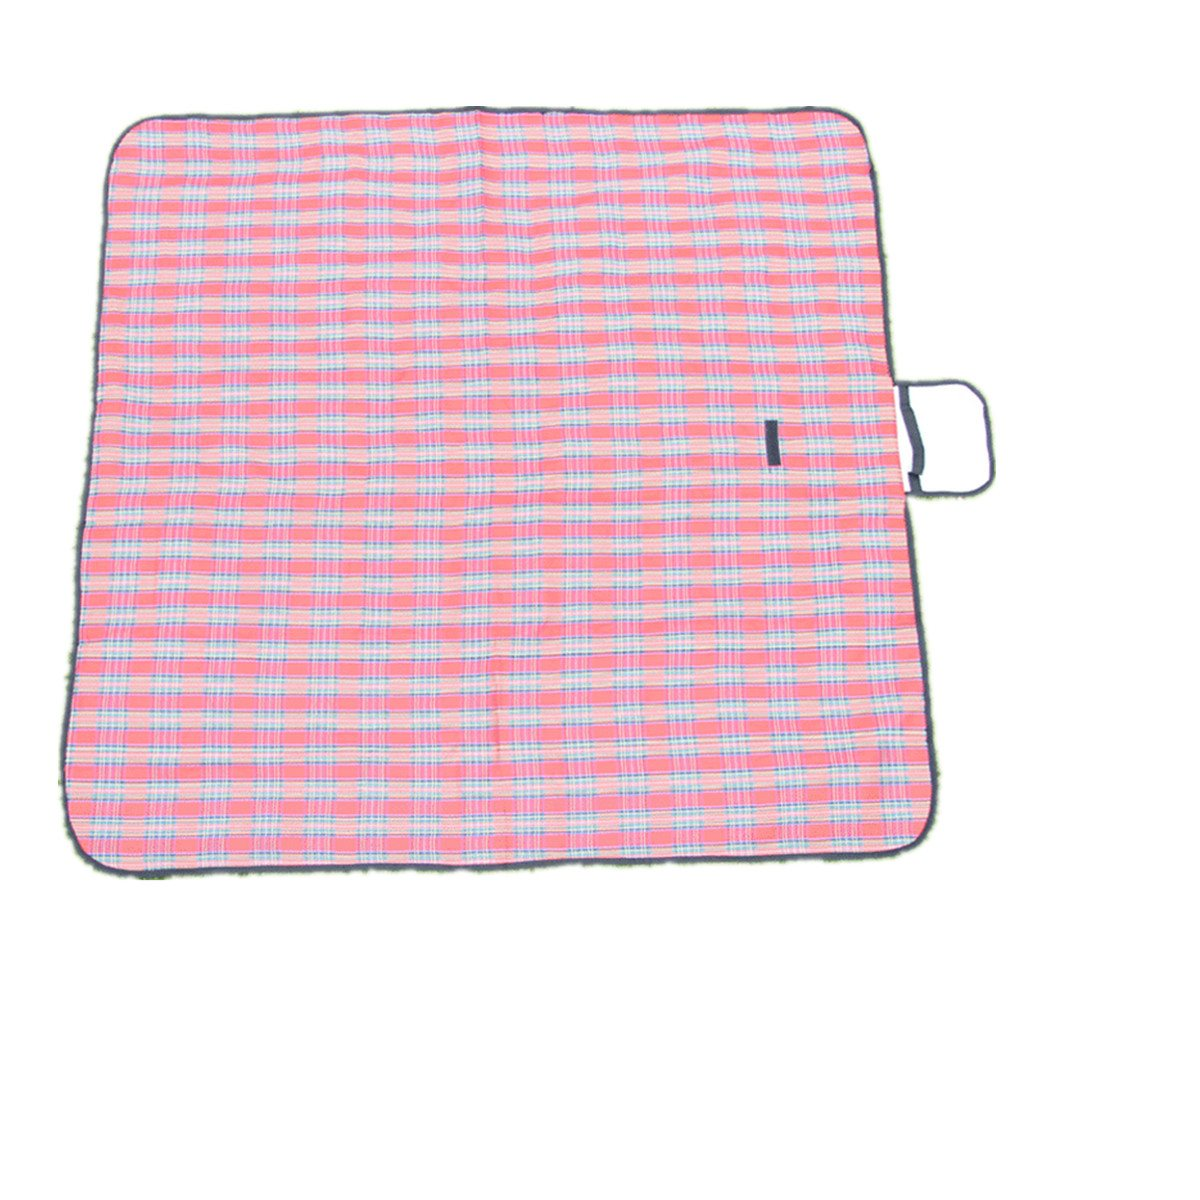 Waterproof Moistureproof Oxford Fabric Outdoor portable Beach Picnic Camping Mat Foldable Baby Climb Plaid Blanket 130x150cm